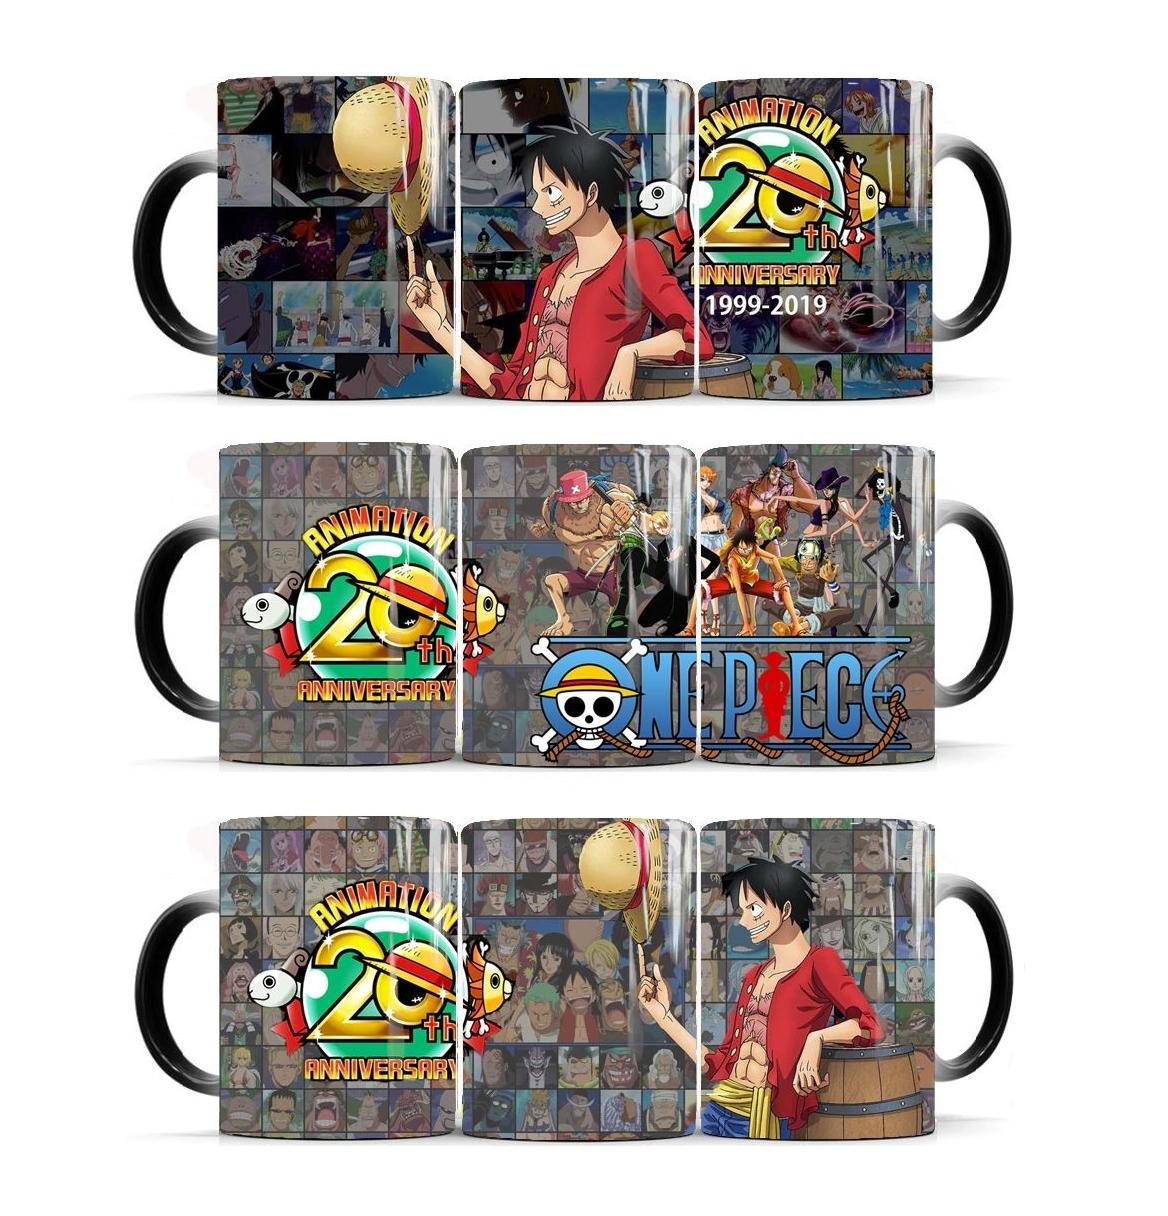 Mug One Piece Thermo-réactif 20th Anniversary